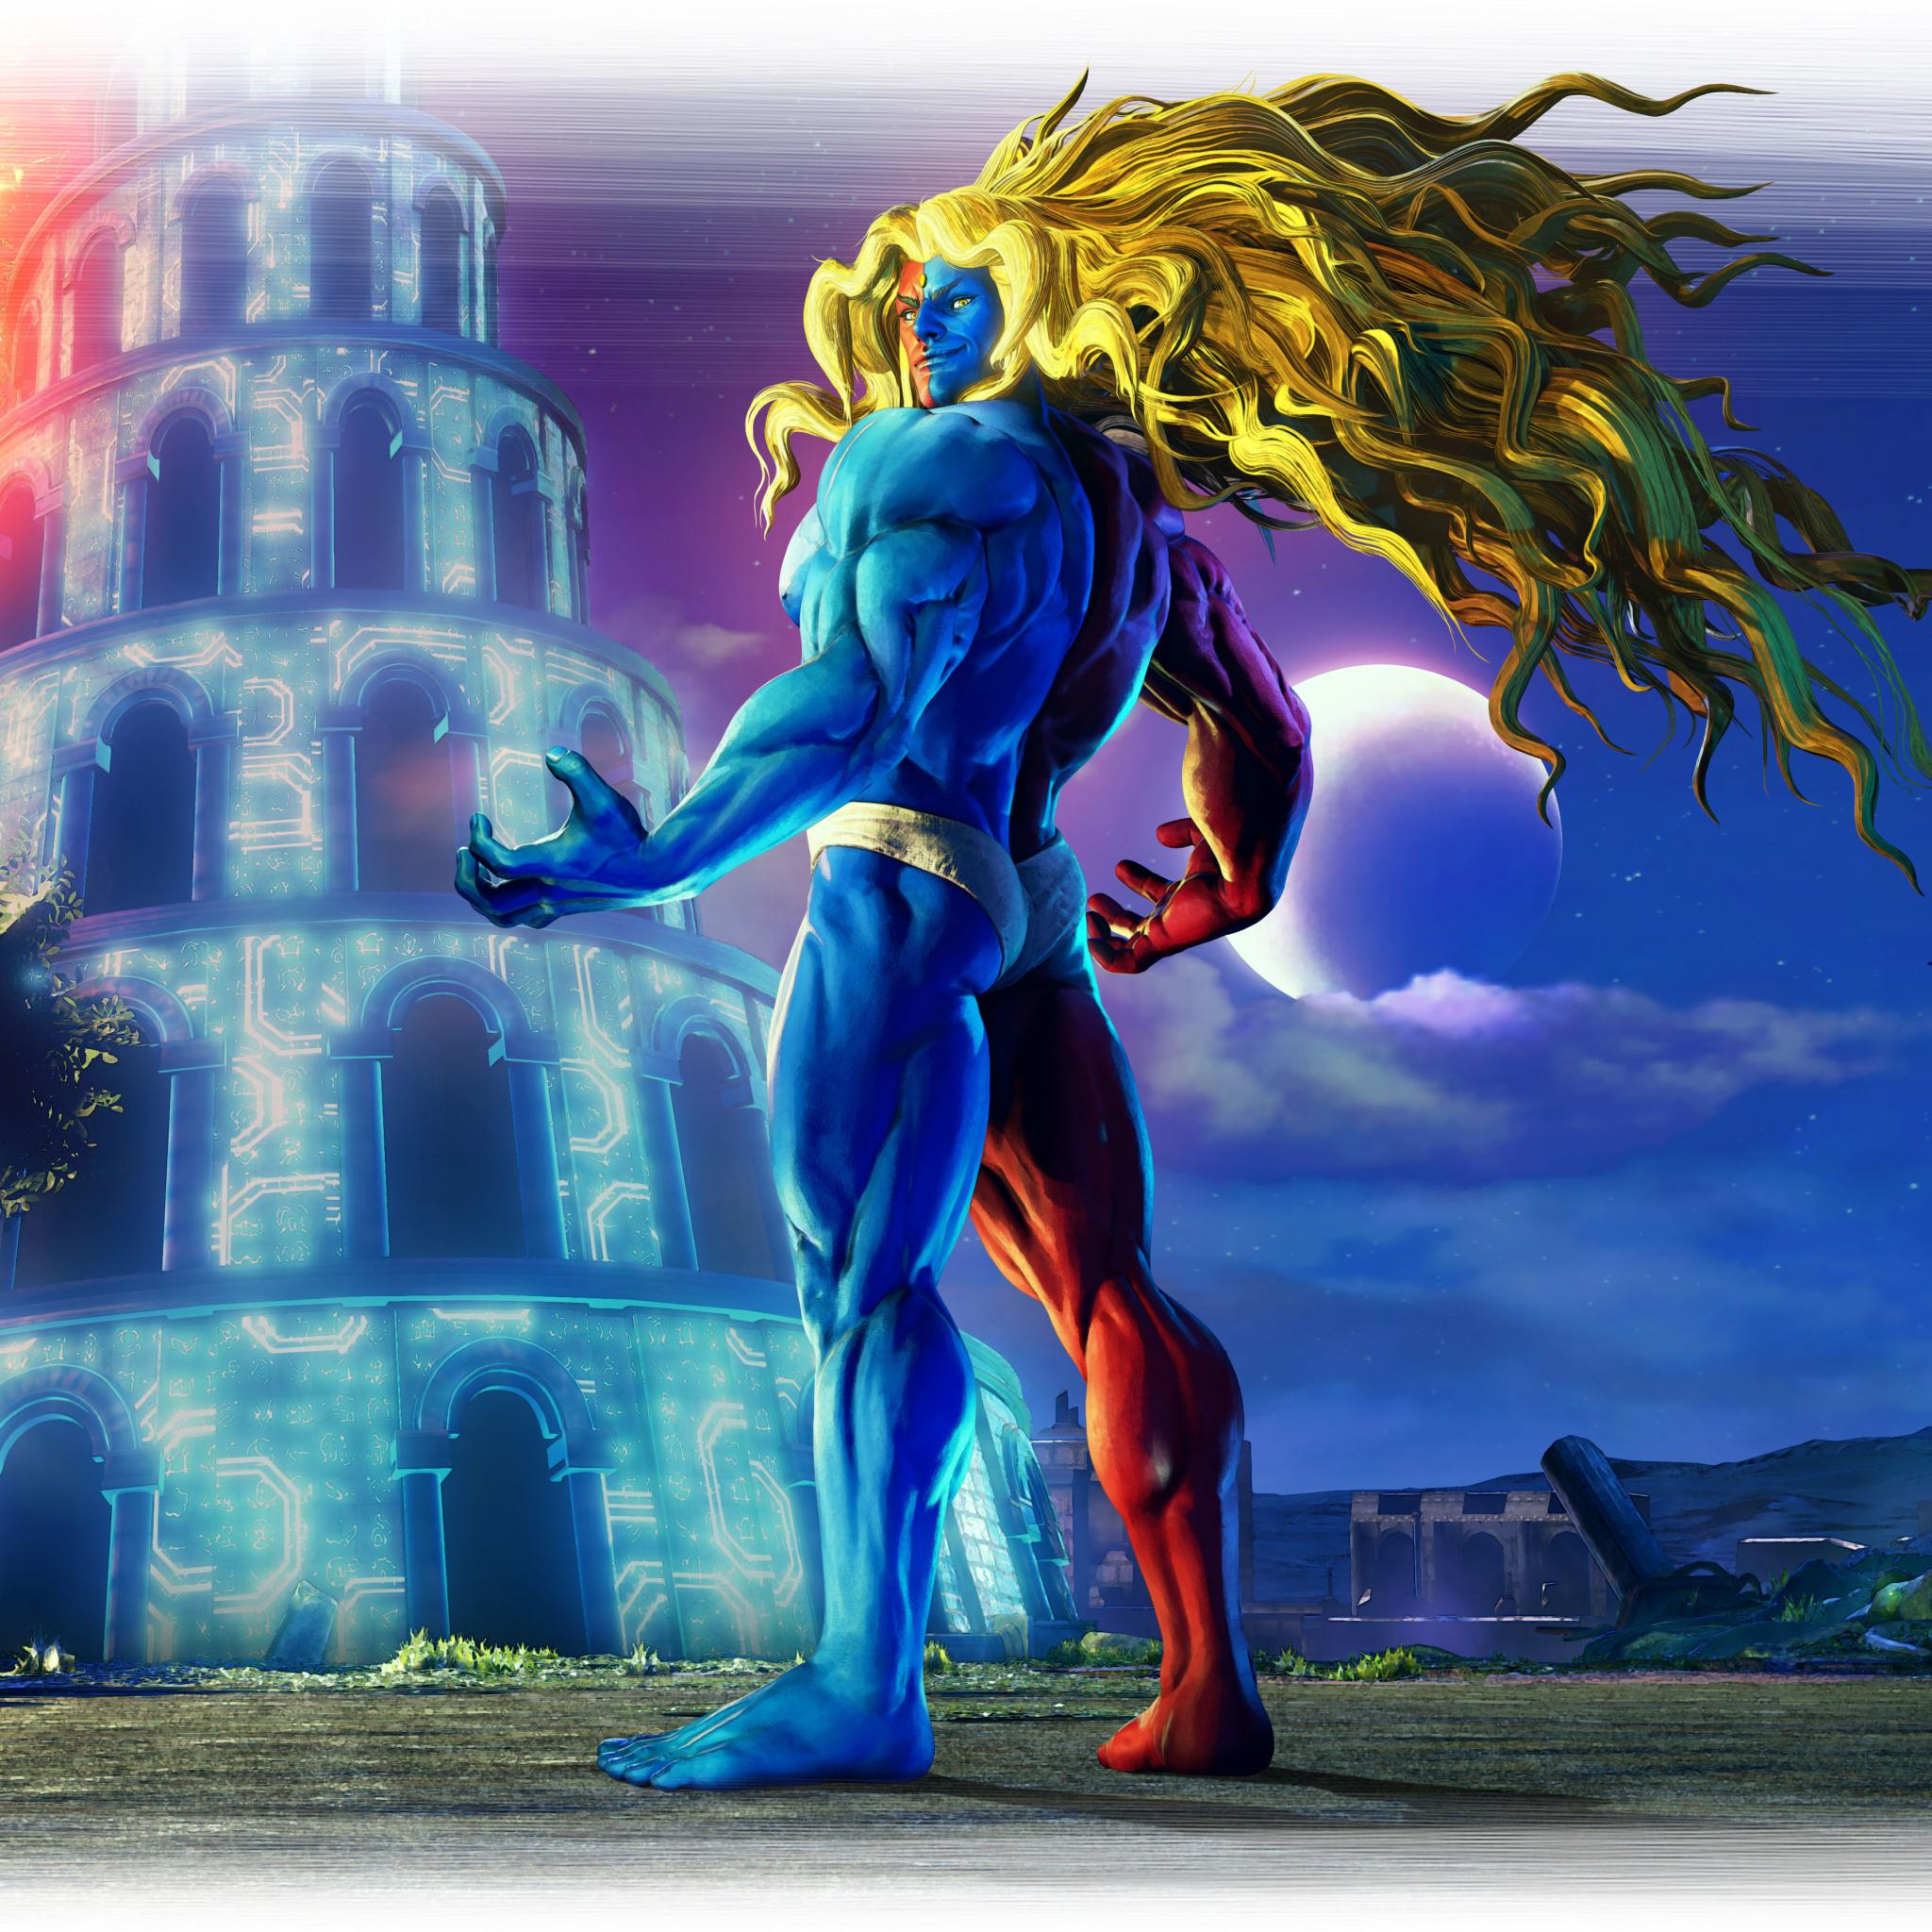 2048x2048 Gill In Street Fighter 5 Ipad Air Wallpaper Hd Games 4k